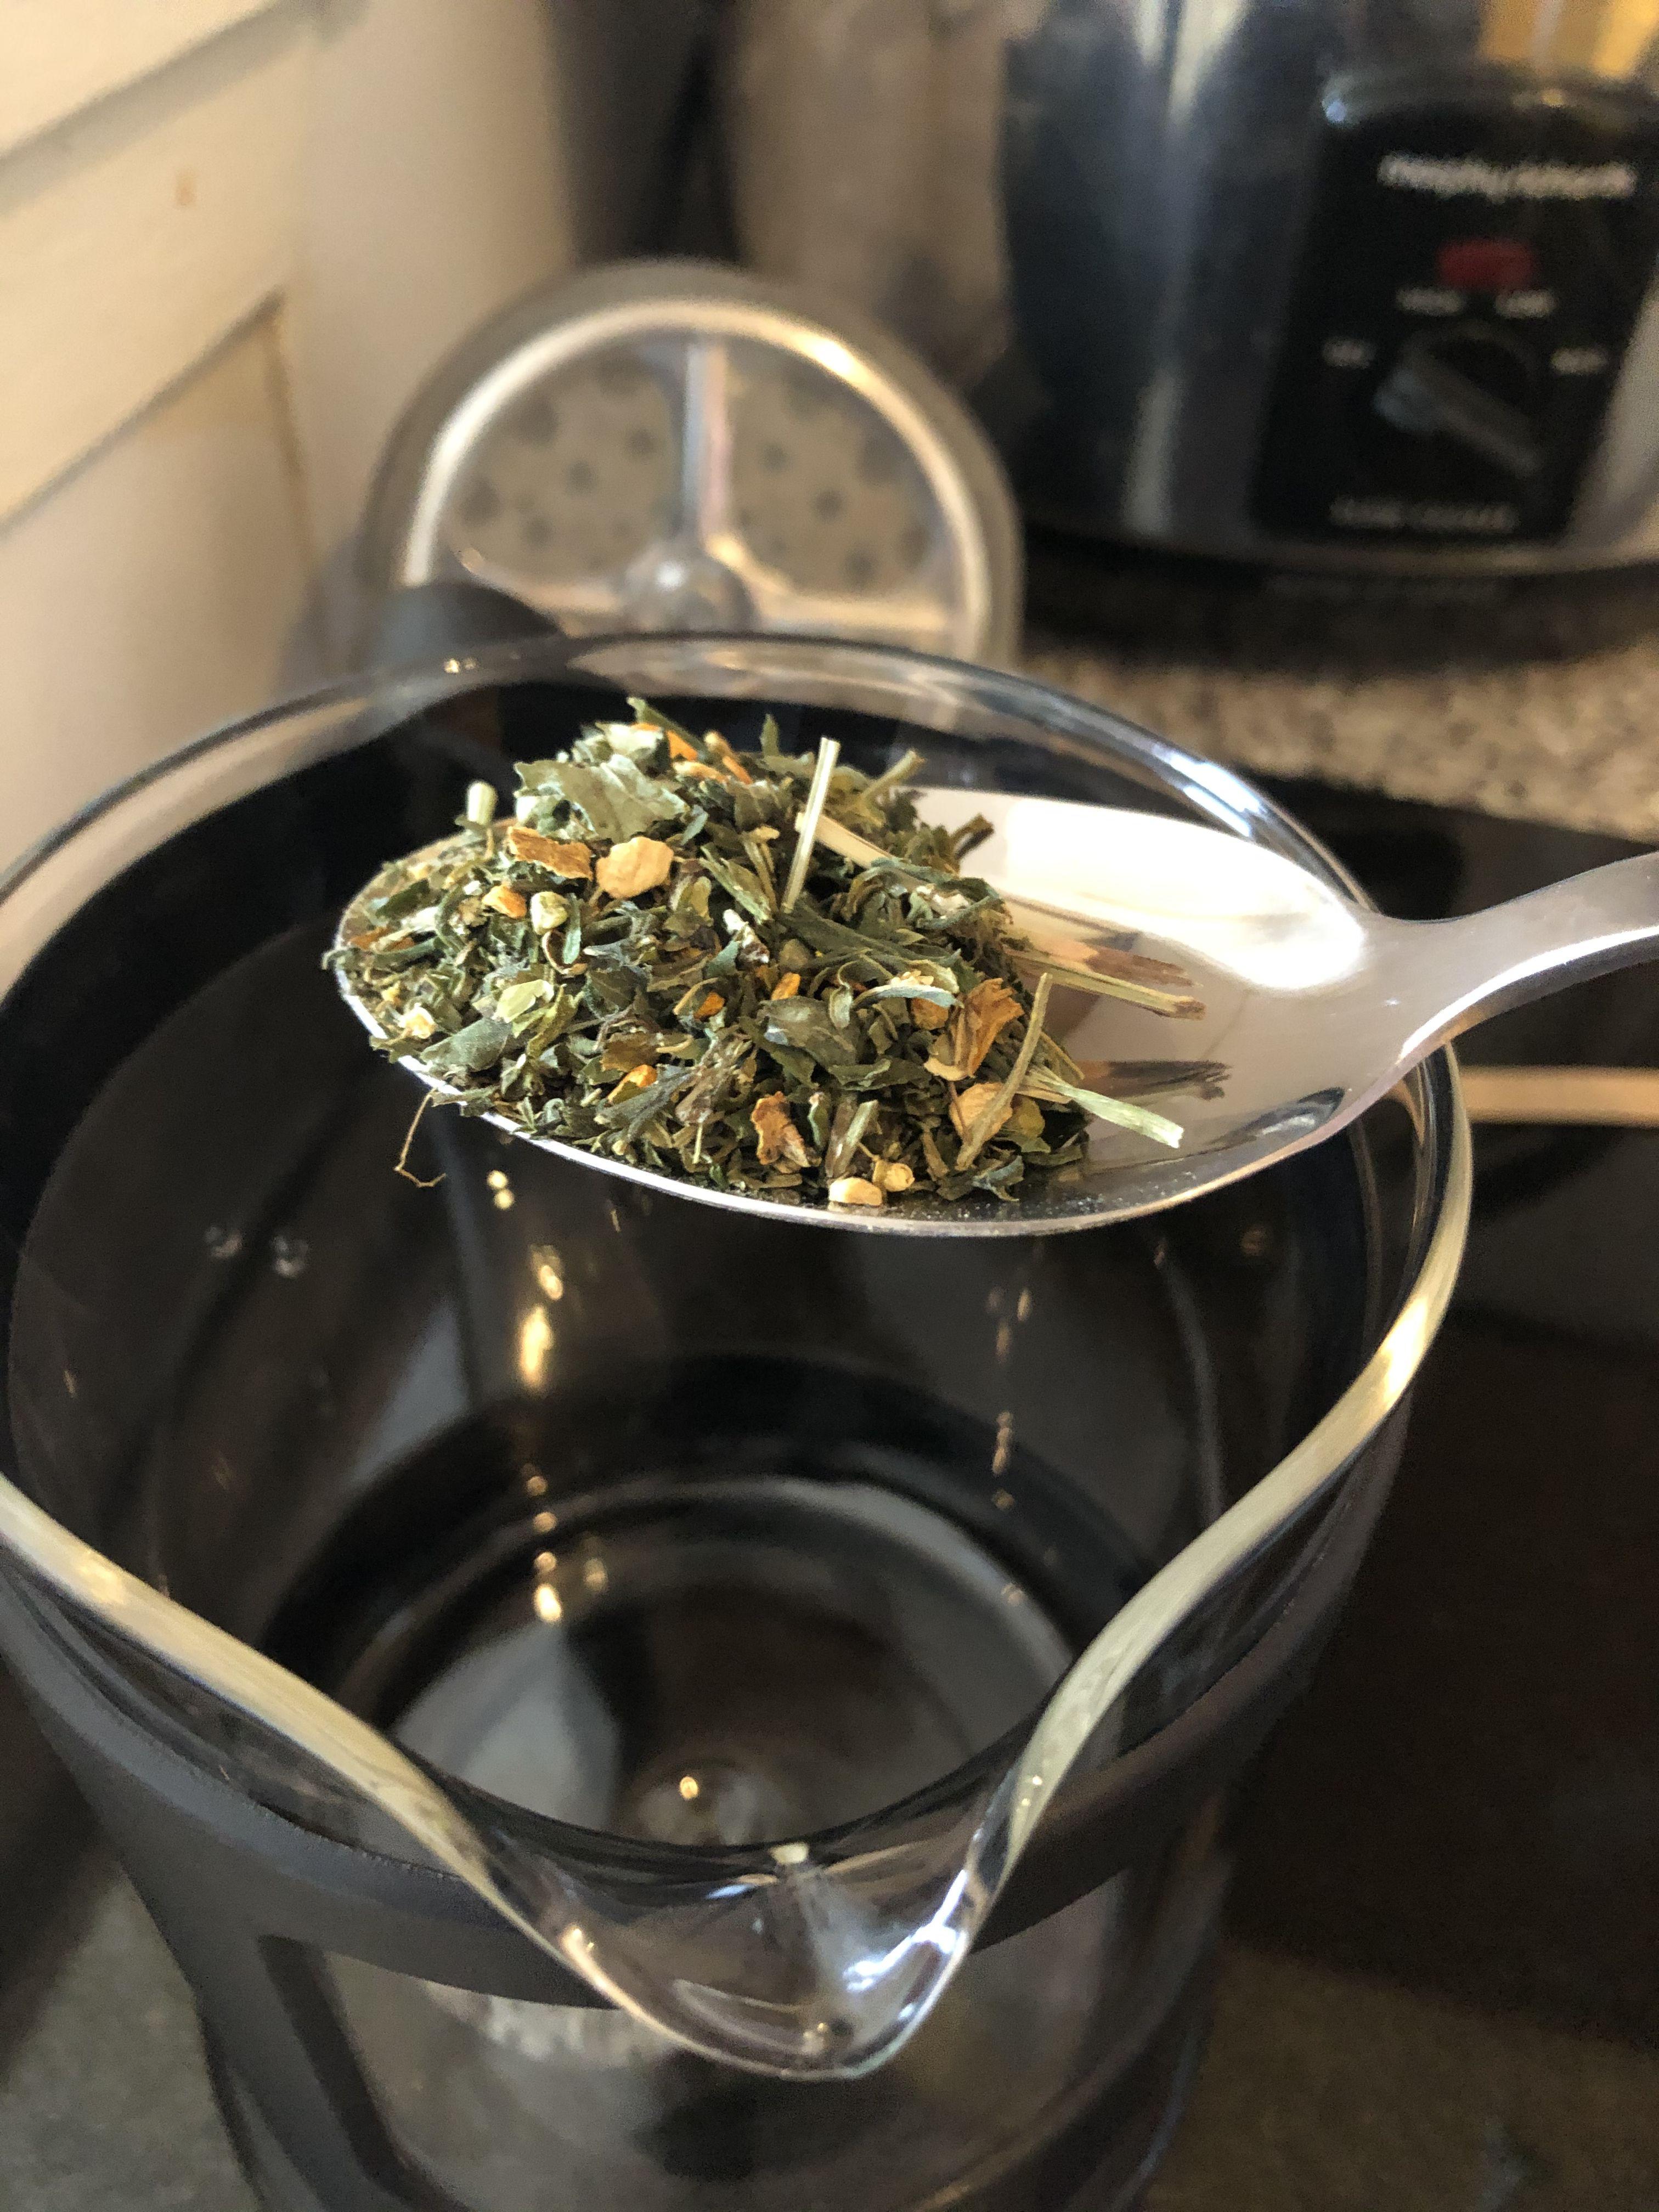 #endocannabinoidsystem #cbd #cbdpaste #cbdisolate #cbdoil #cannabis #hemp #420 #cannabiscommunity #cannabisculture #healthyfood #healthylifestyle #natural #naturalhealth #cbdflowers #cbdbenefits #positivity #cbdiablo #cannabinoids #cannabidiol #edinburgh #scotland #uk #cbdheals #cbdhelps #cbdflower #scottishcannabiscommunity #glasgow #edinburgh #scotland #1500mgcbdoil #500mgcbdoil #1000mgcbdoil #newyearsresolution #ukmade #fullspectrum #420  #cbg #cbda